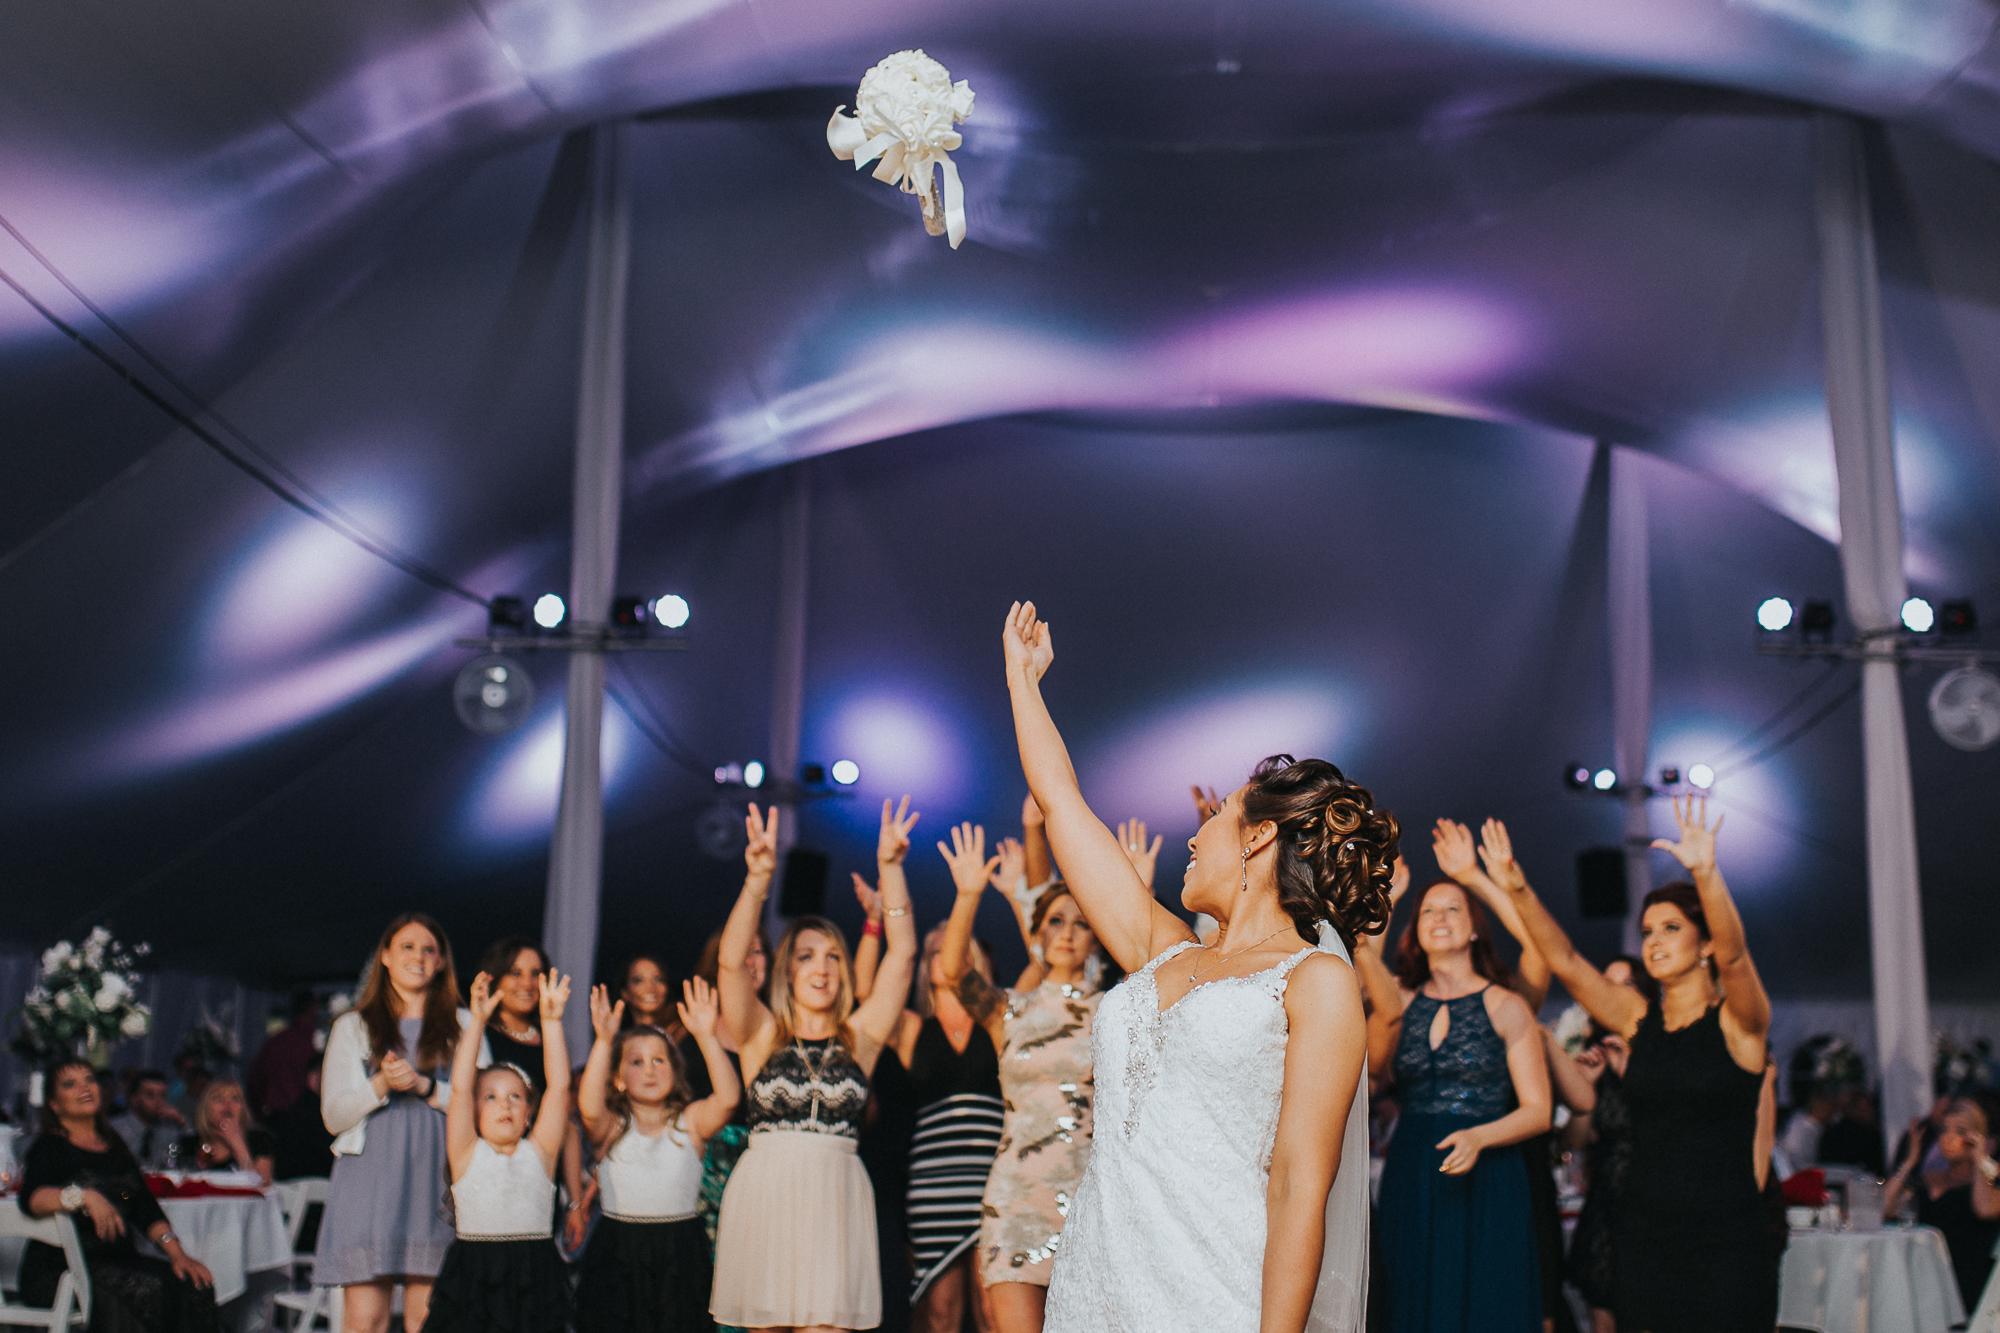 Christina-and-Gene-Wedding-Marla-Rain-Photography-562.jpg